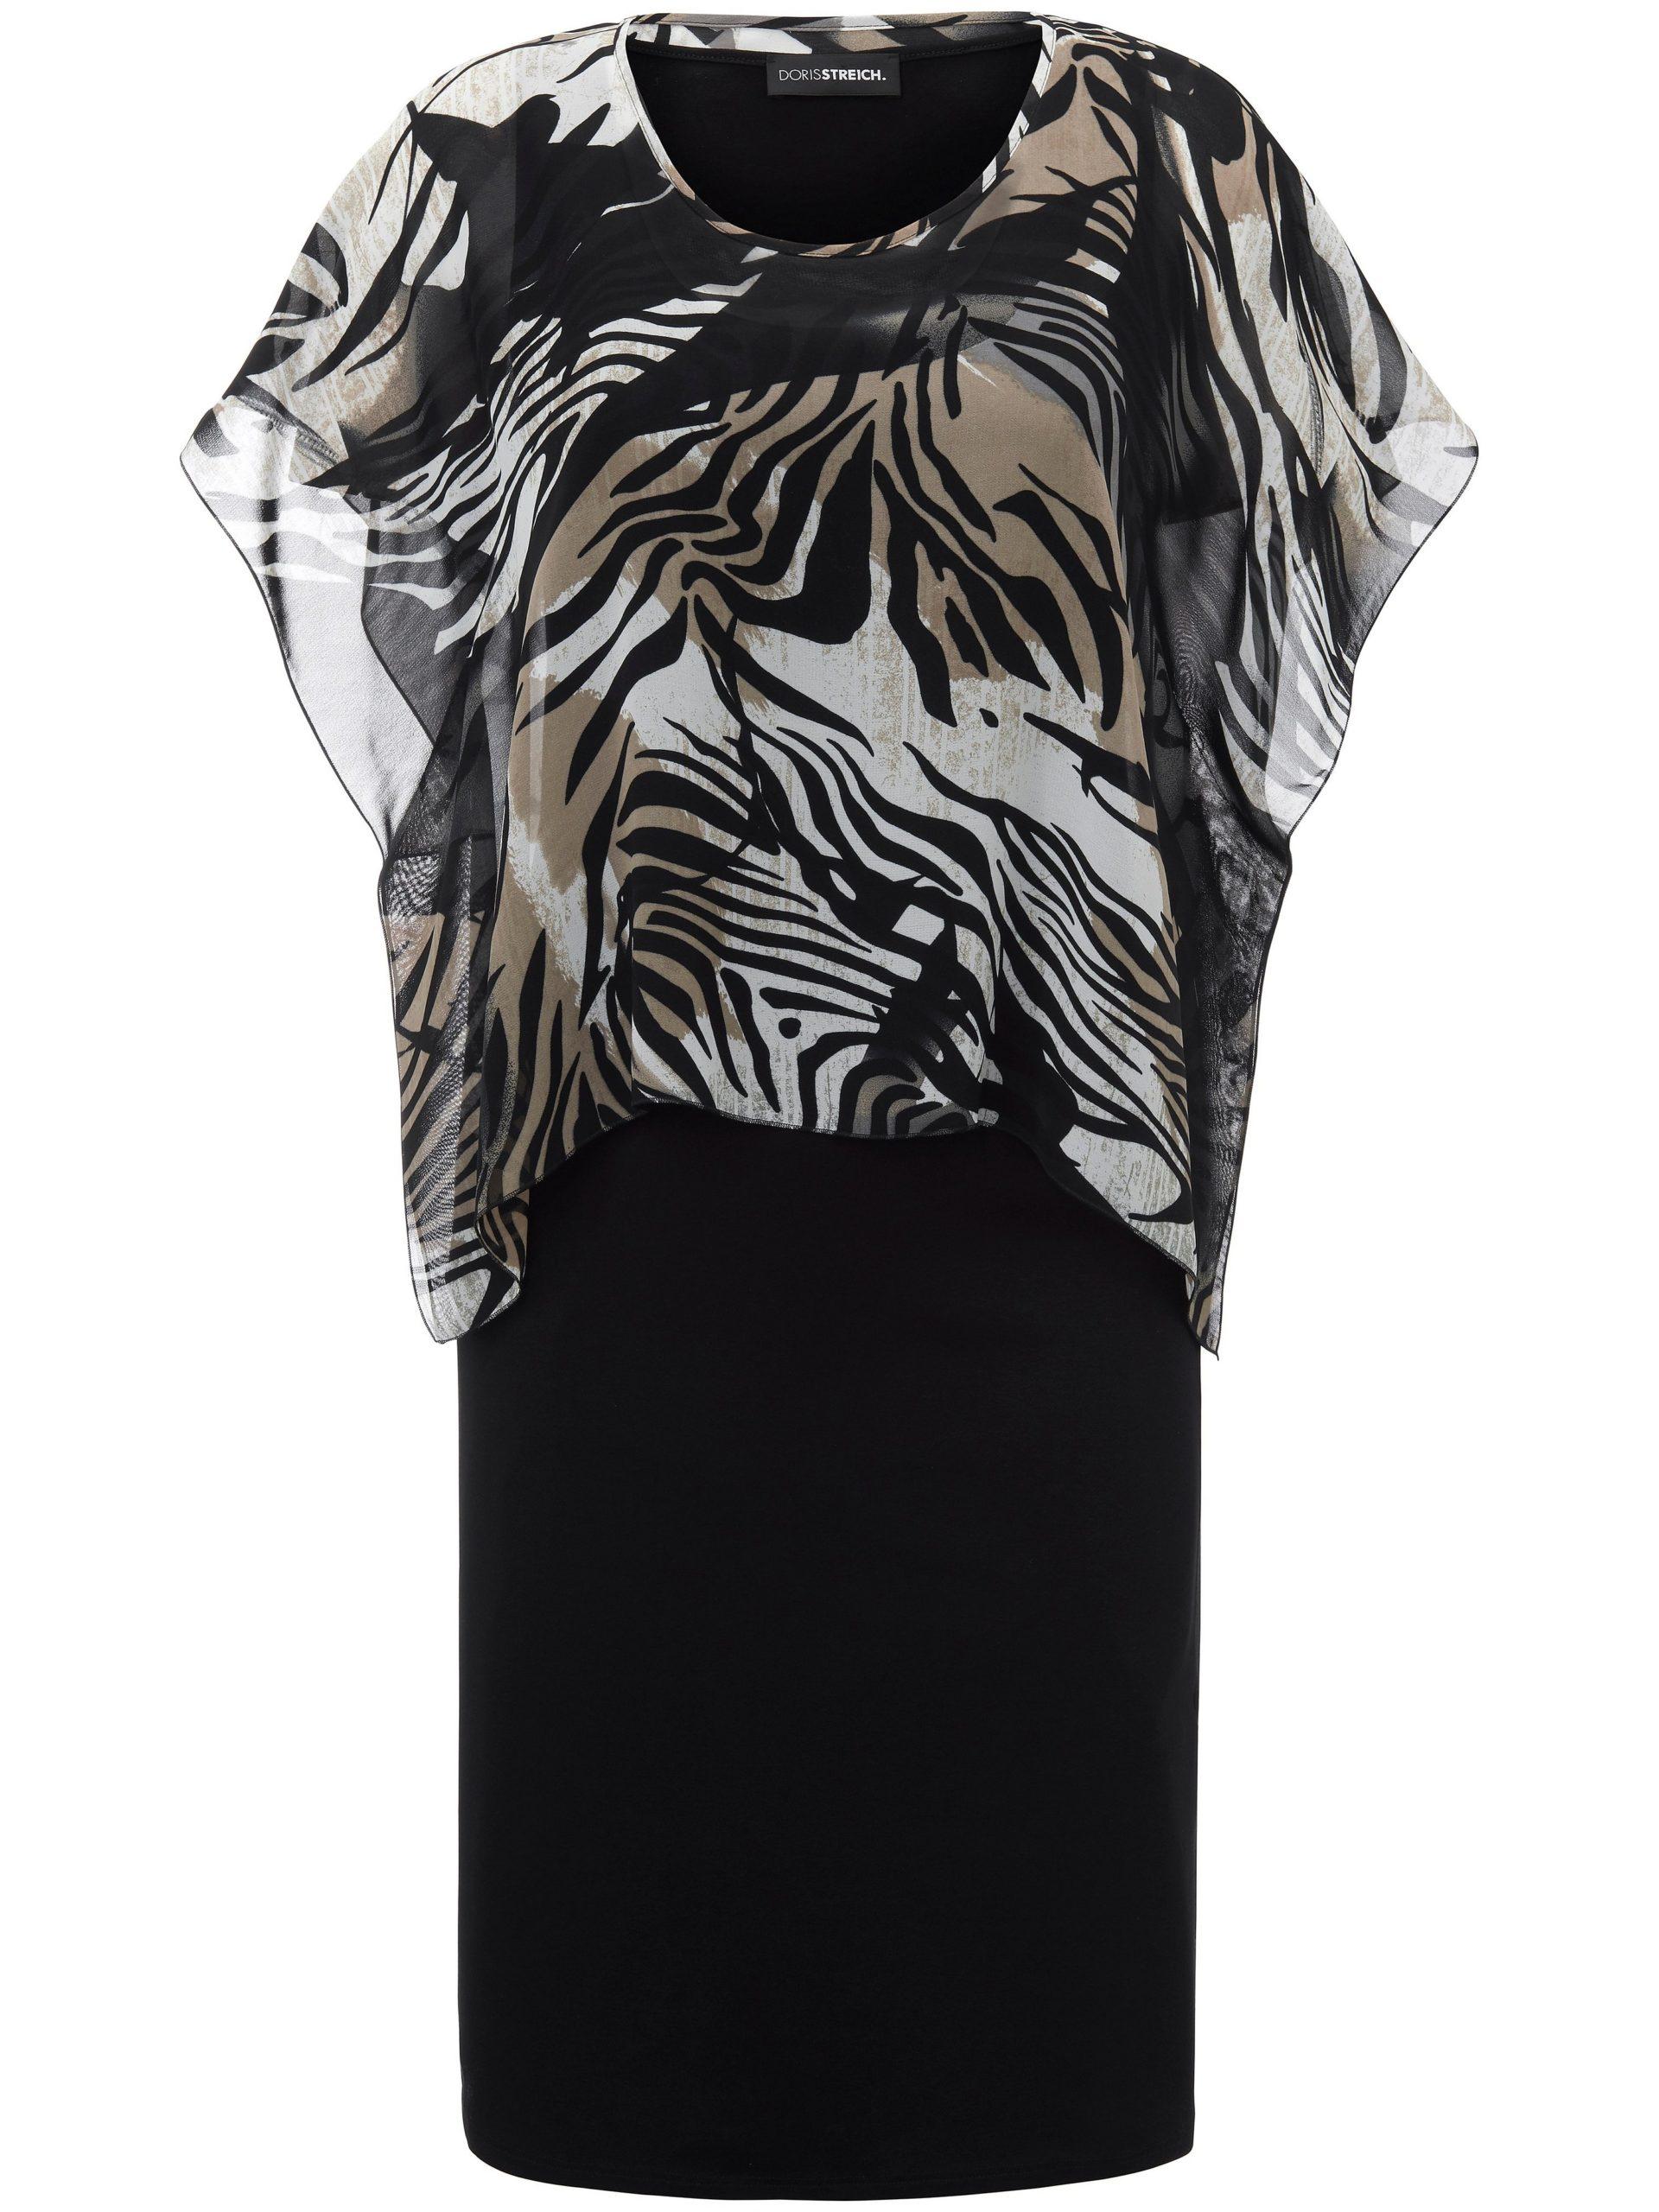 2-in-1-jurk Van Doris Streich multicolour Kopen